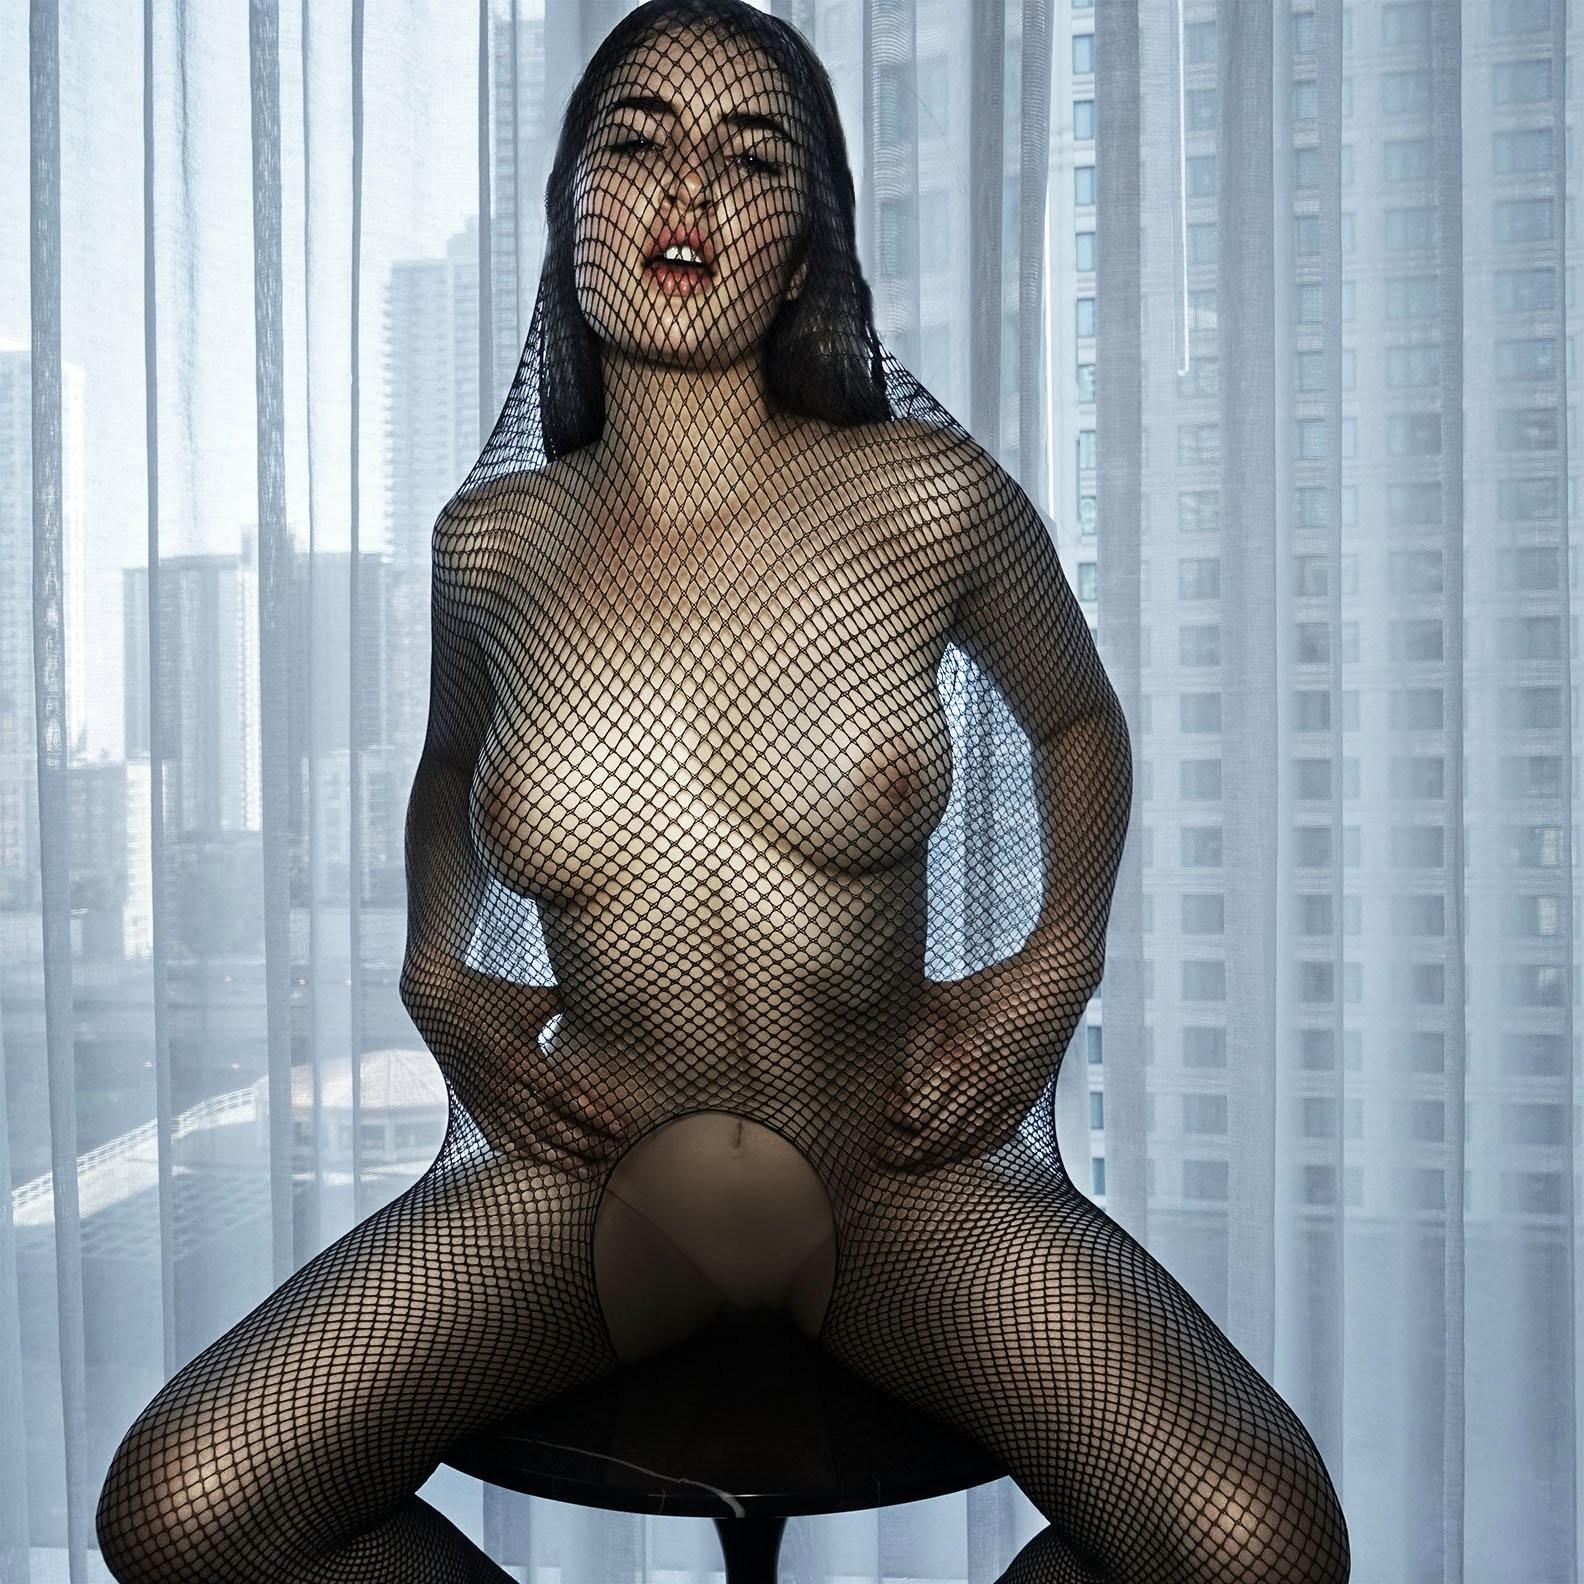 Ariane labed nude sex scene on scandalplanetcom - 3 part 5